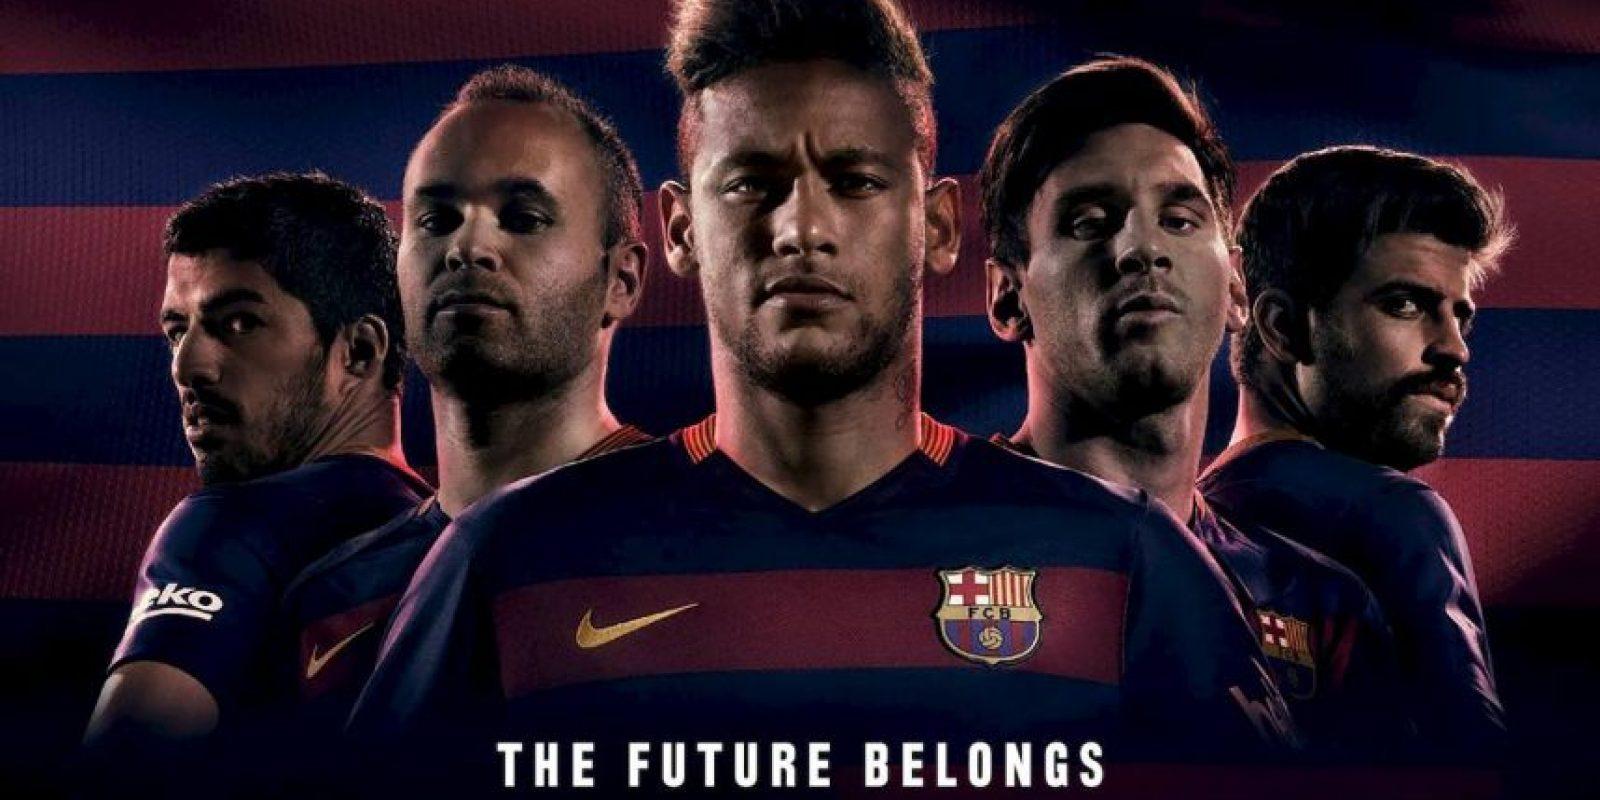 La nueva camiseta del Barcelona causó revuelo. Foto:fcbarcelona.com